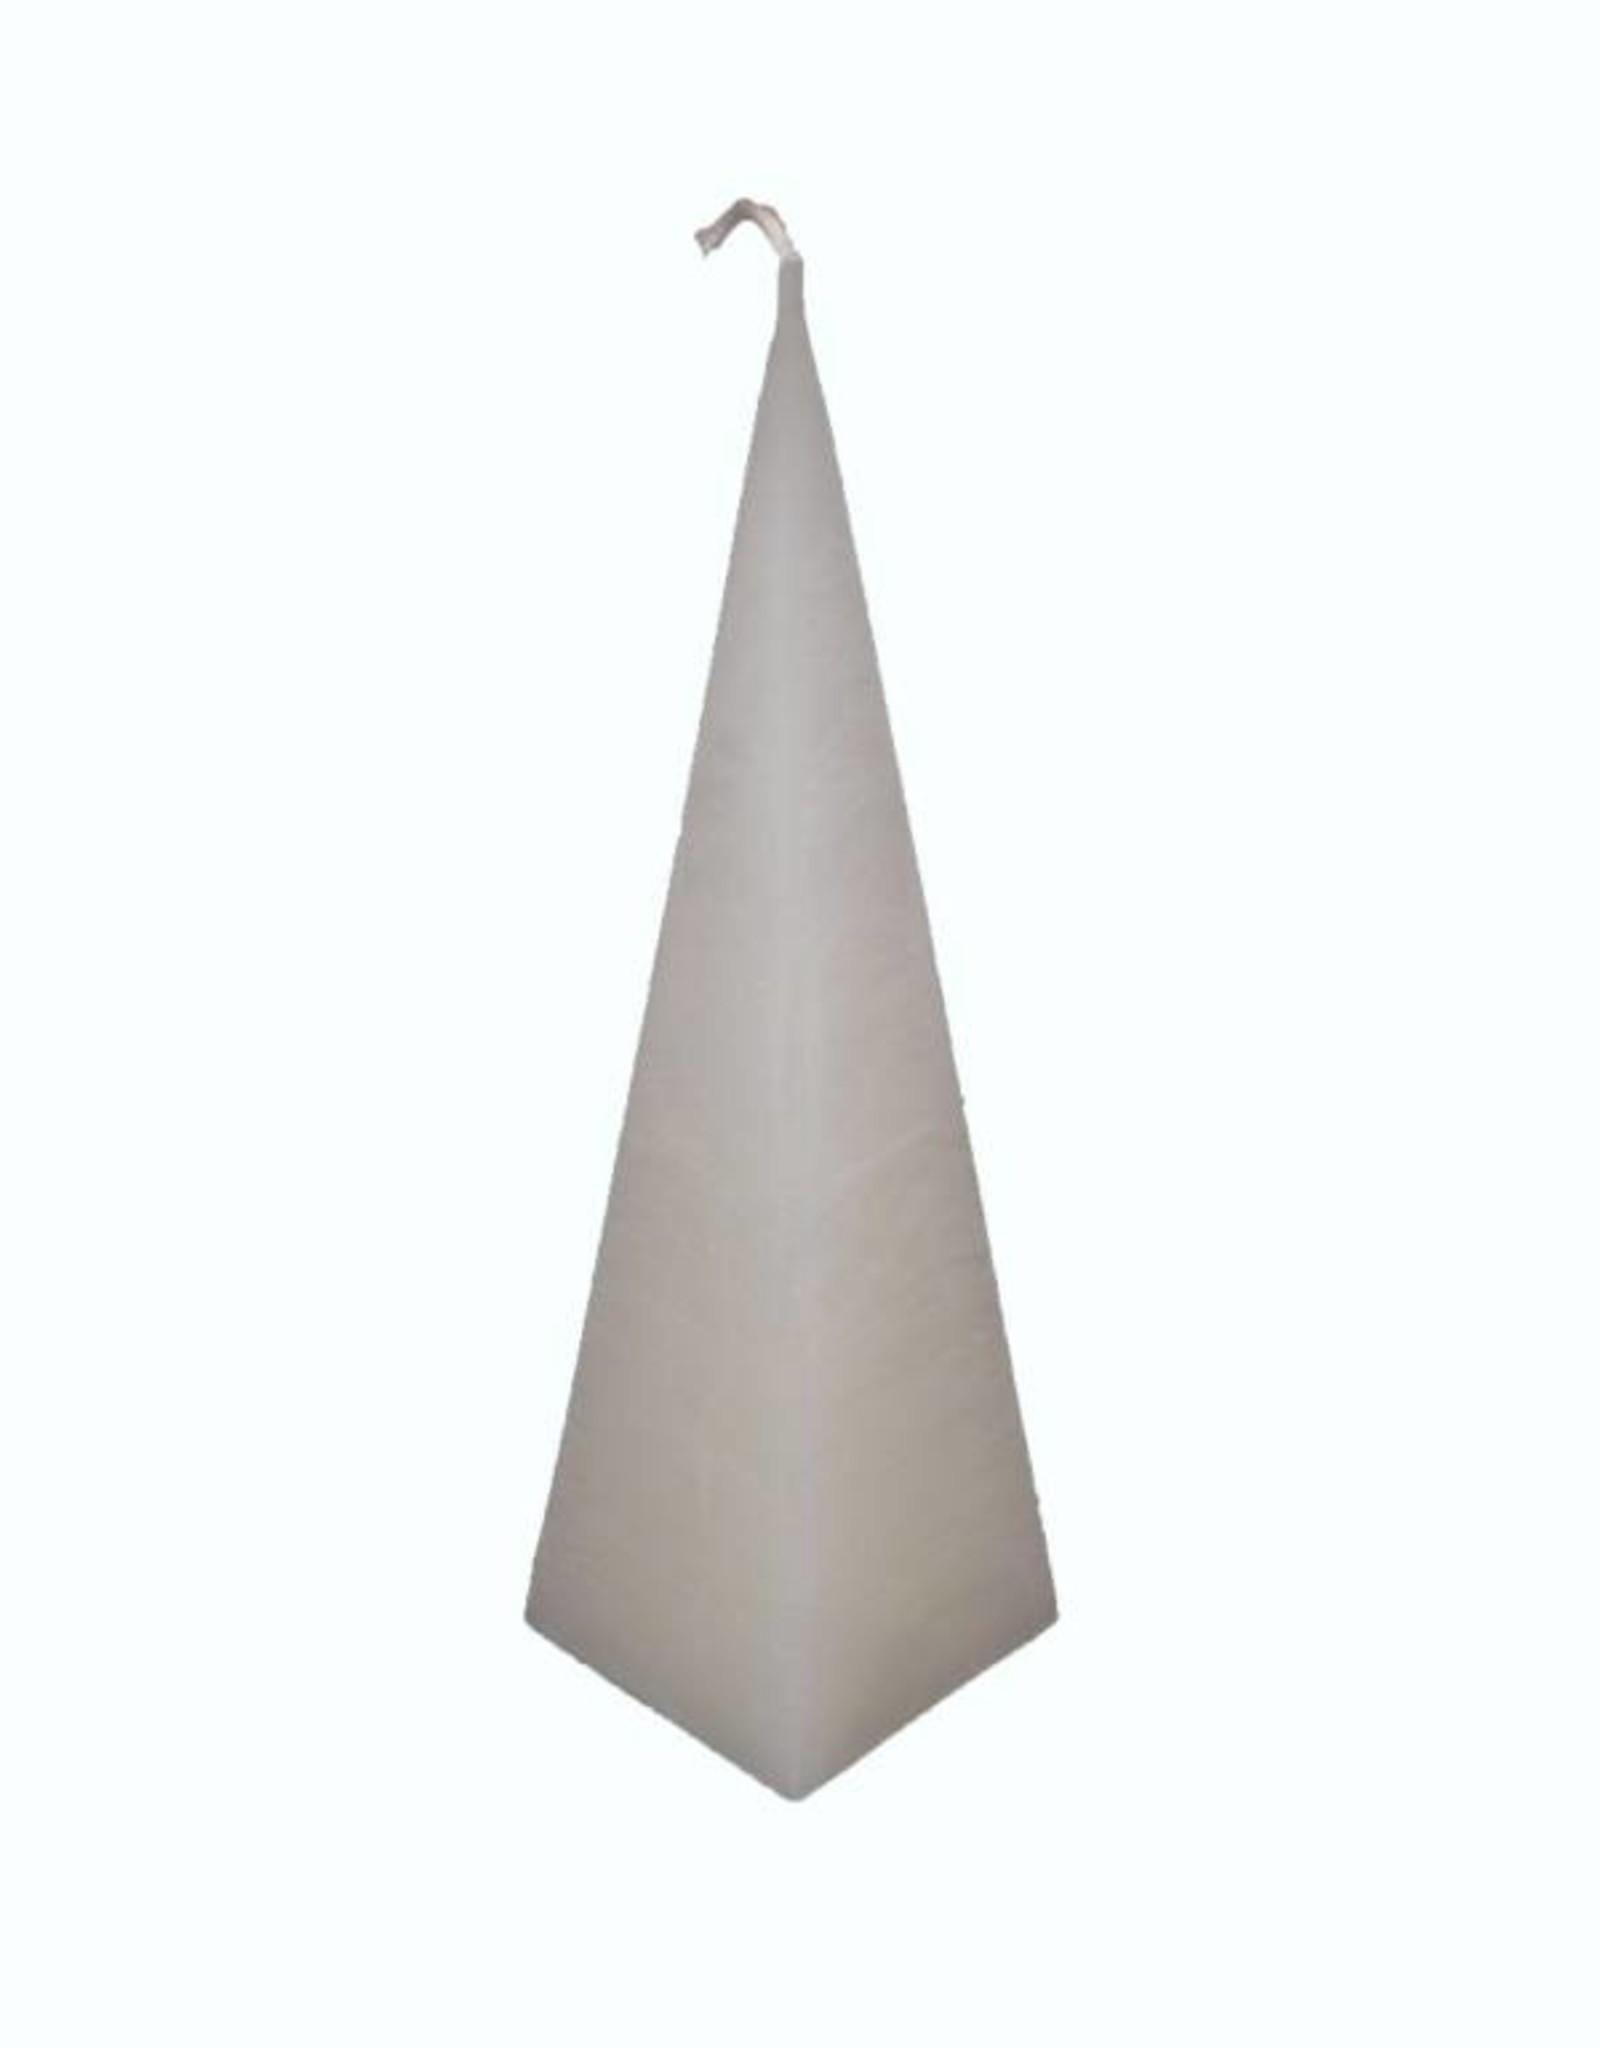 Piramide Kaars Wit Rustiek 6x6x23 cm